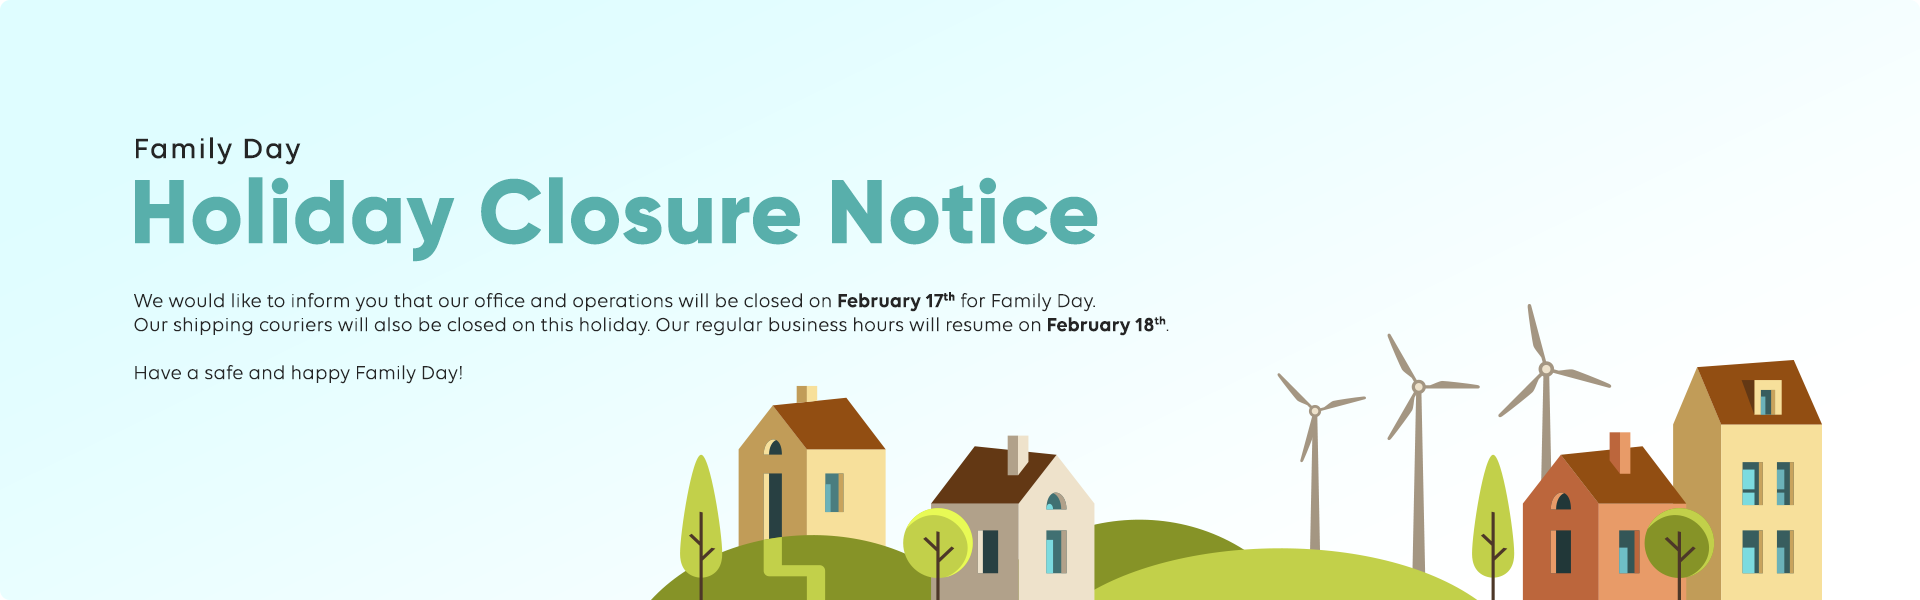 Holiday Closure Notice Family Day